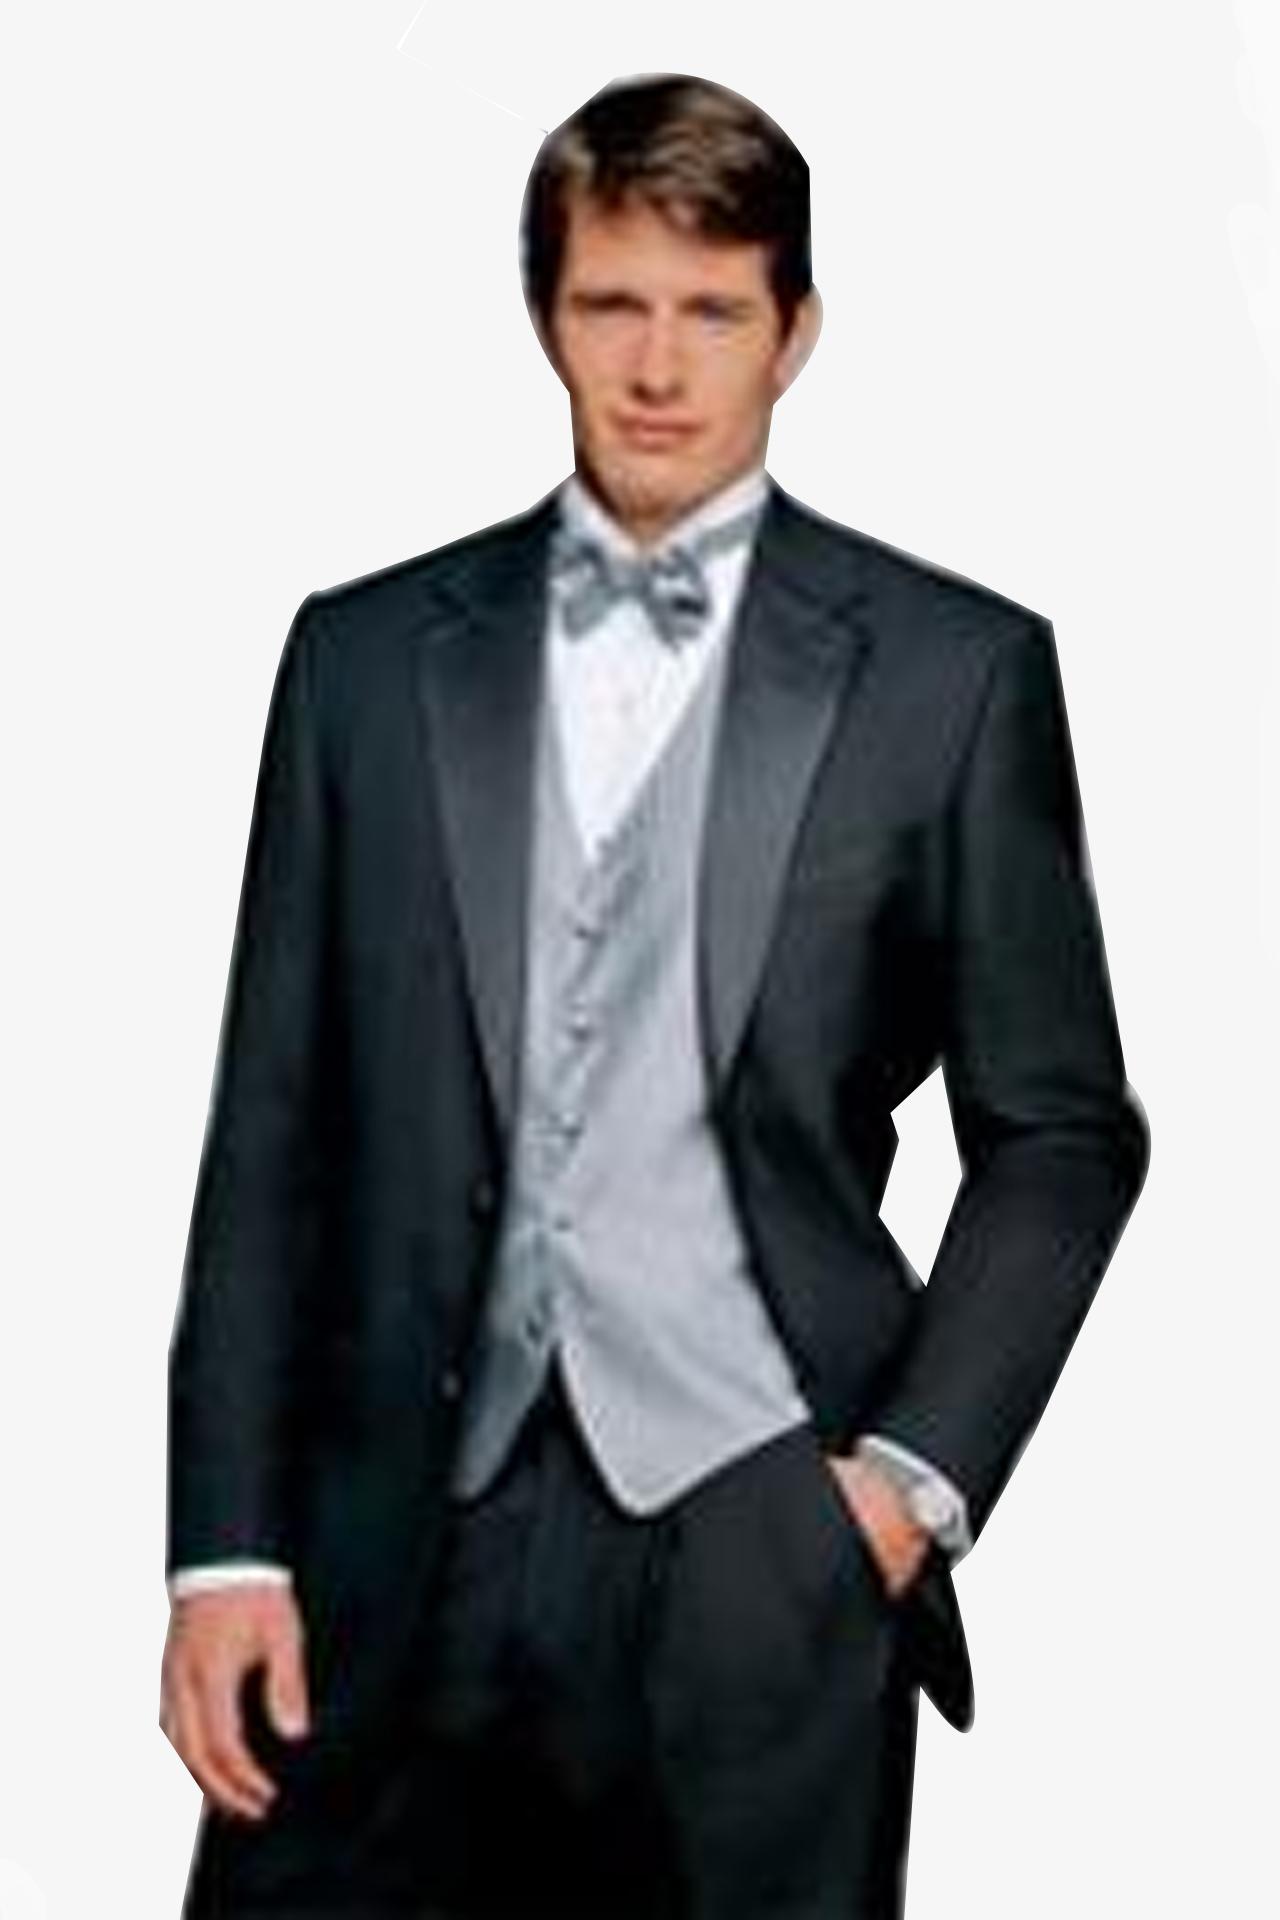 ID#PN-D01 Ralph Lauren (Diplomat) Tuxedo - Superior fabric 120's Wool fabric Tuxedo Dark color black